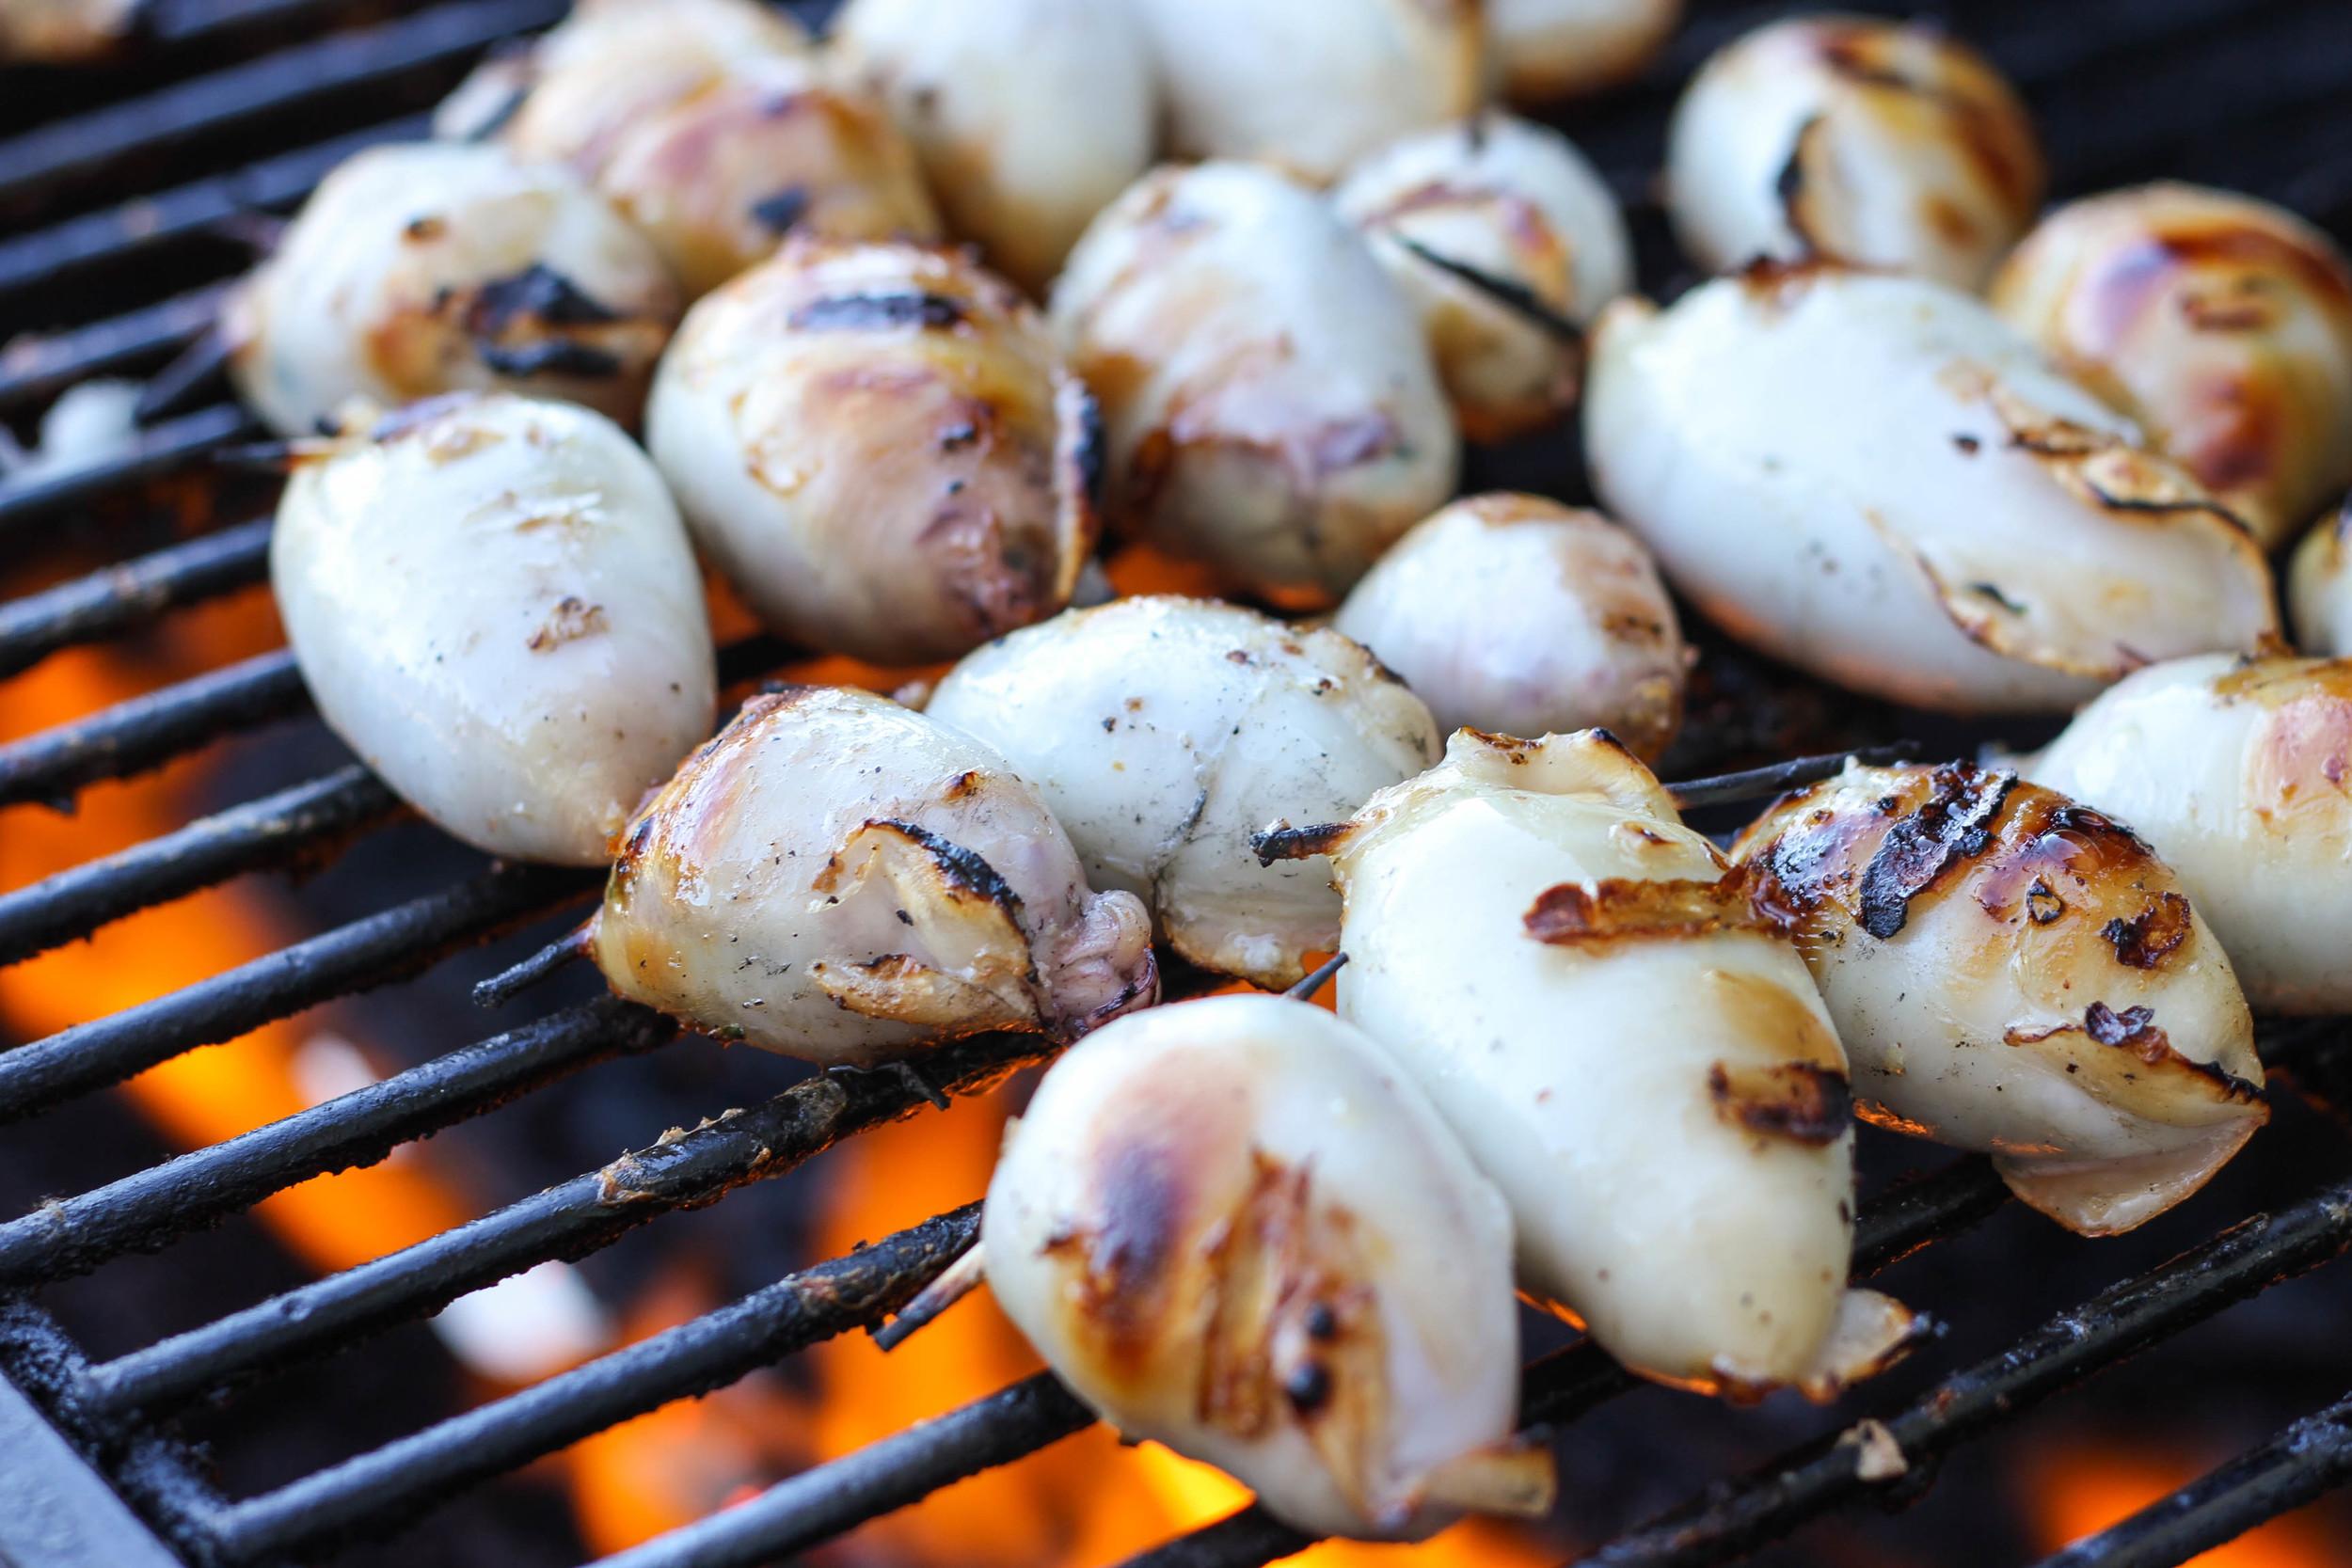 Grilling stuffed calamari